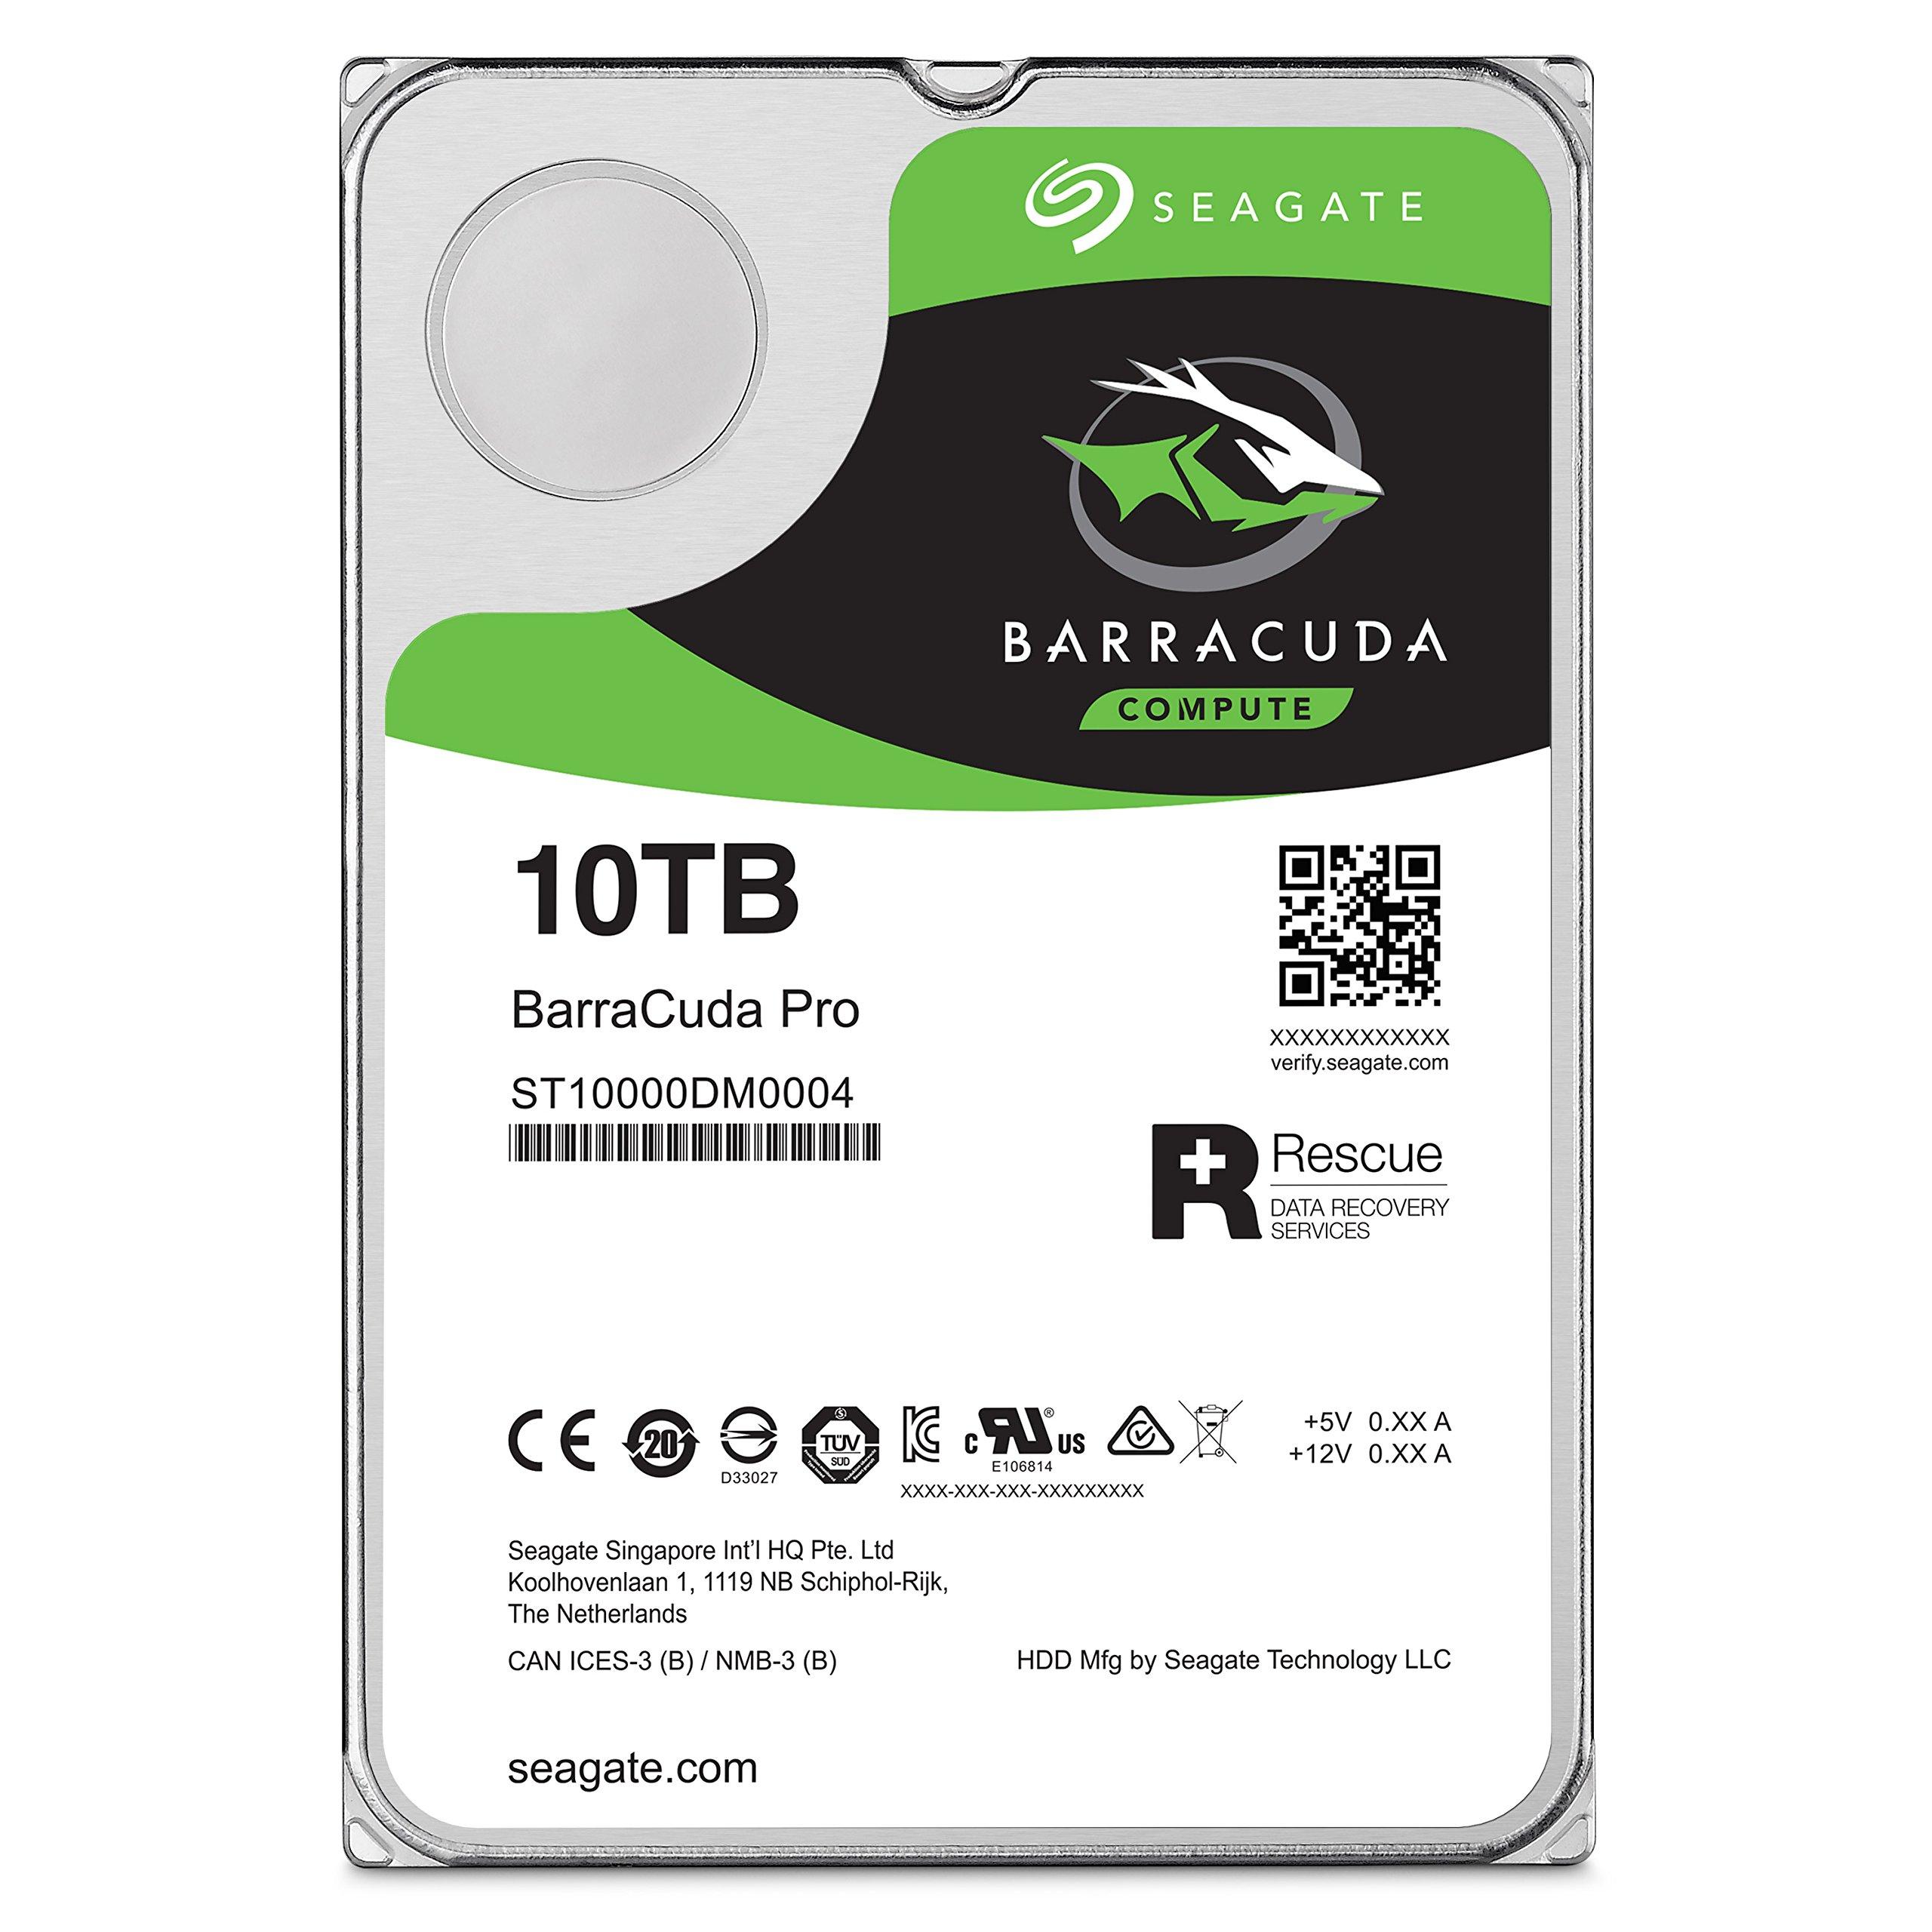 Seagate 10TB BarraCuda Pro 7200RPM SATA 6GB/s 256MB Cache 3.5-Inch Internal Hard Drive (ST10000DM0004) by Seagate